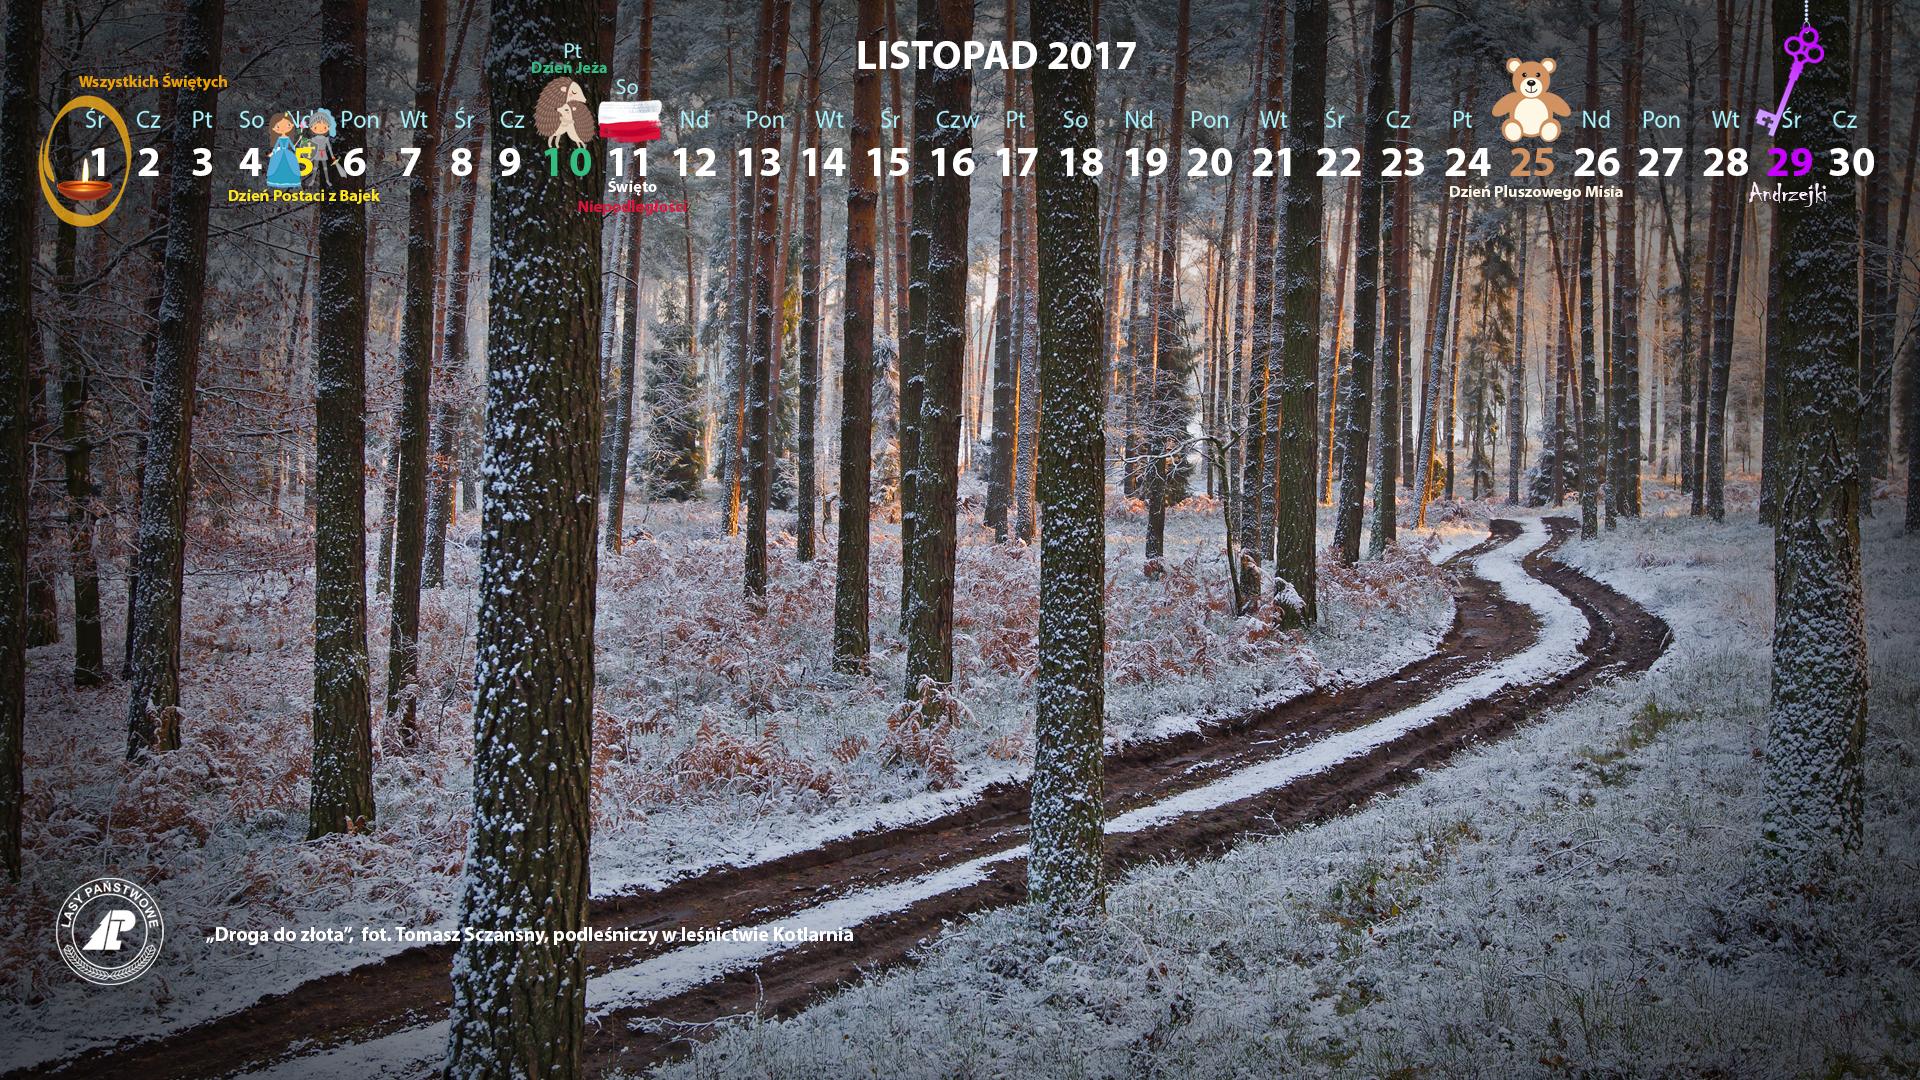 Kalendarz_listopad_2017_1920x1080-1[1].jpg